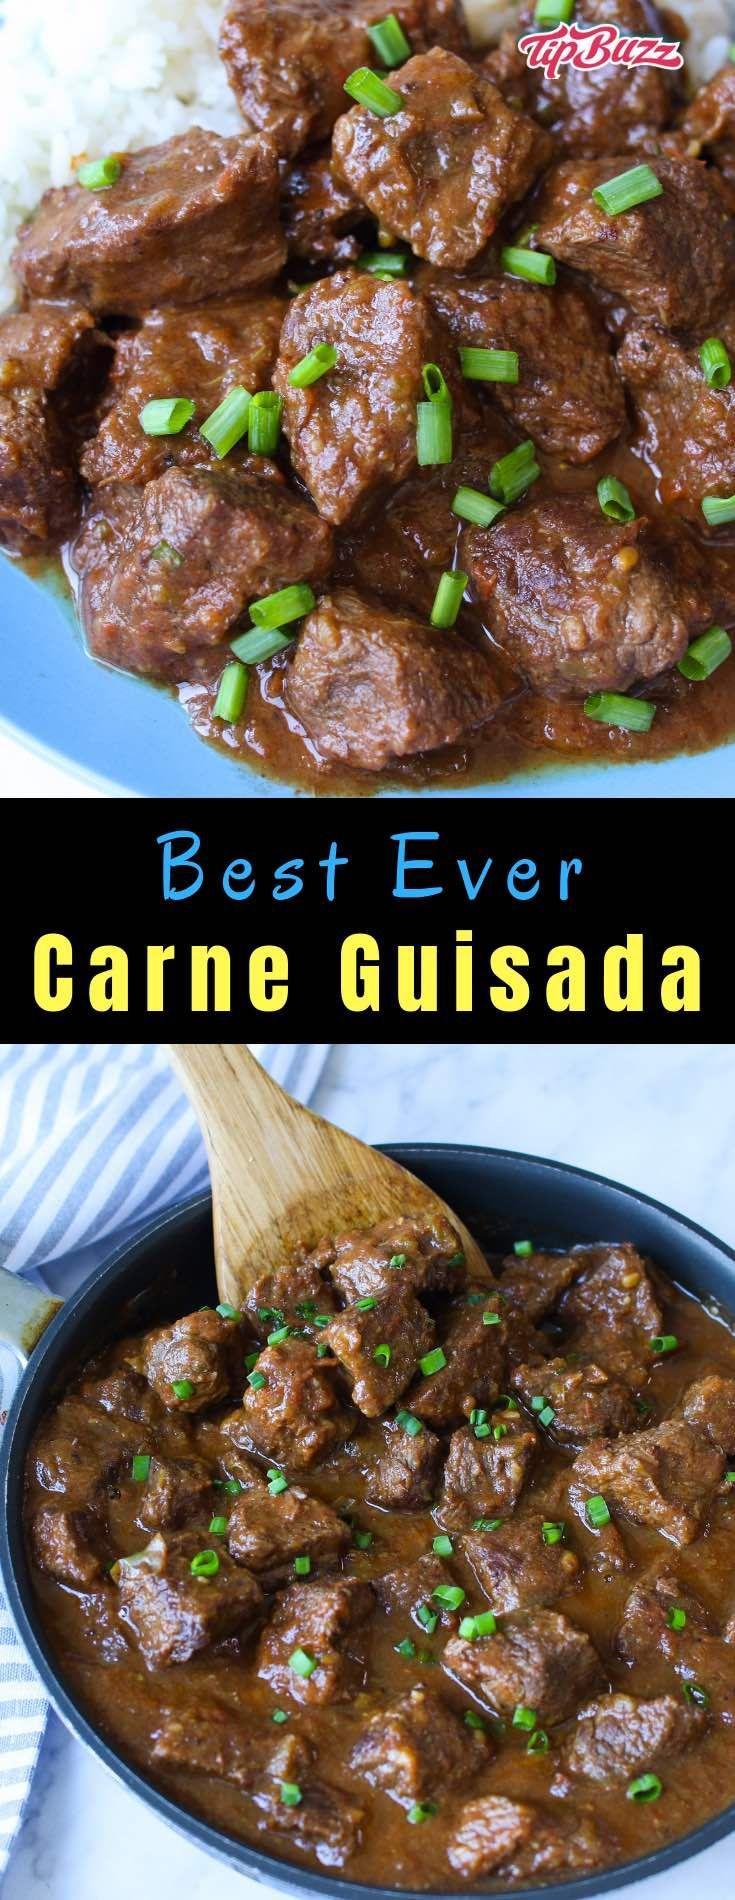 Photo of Carne Guisada Recipe – TipBuzz